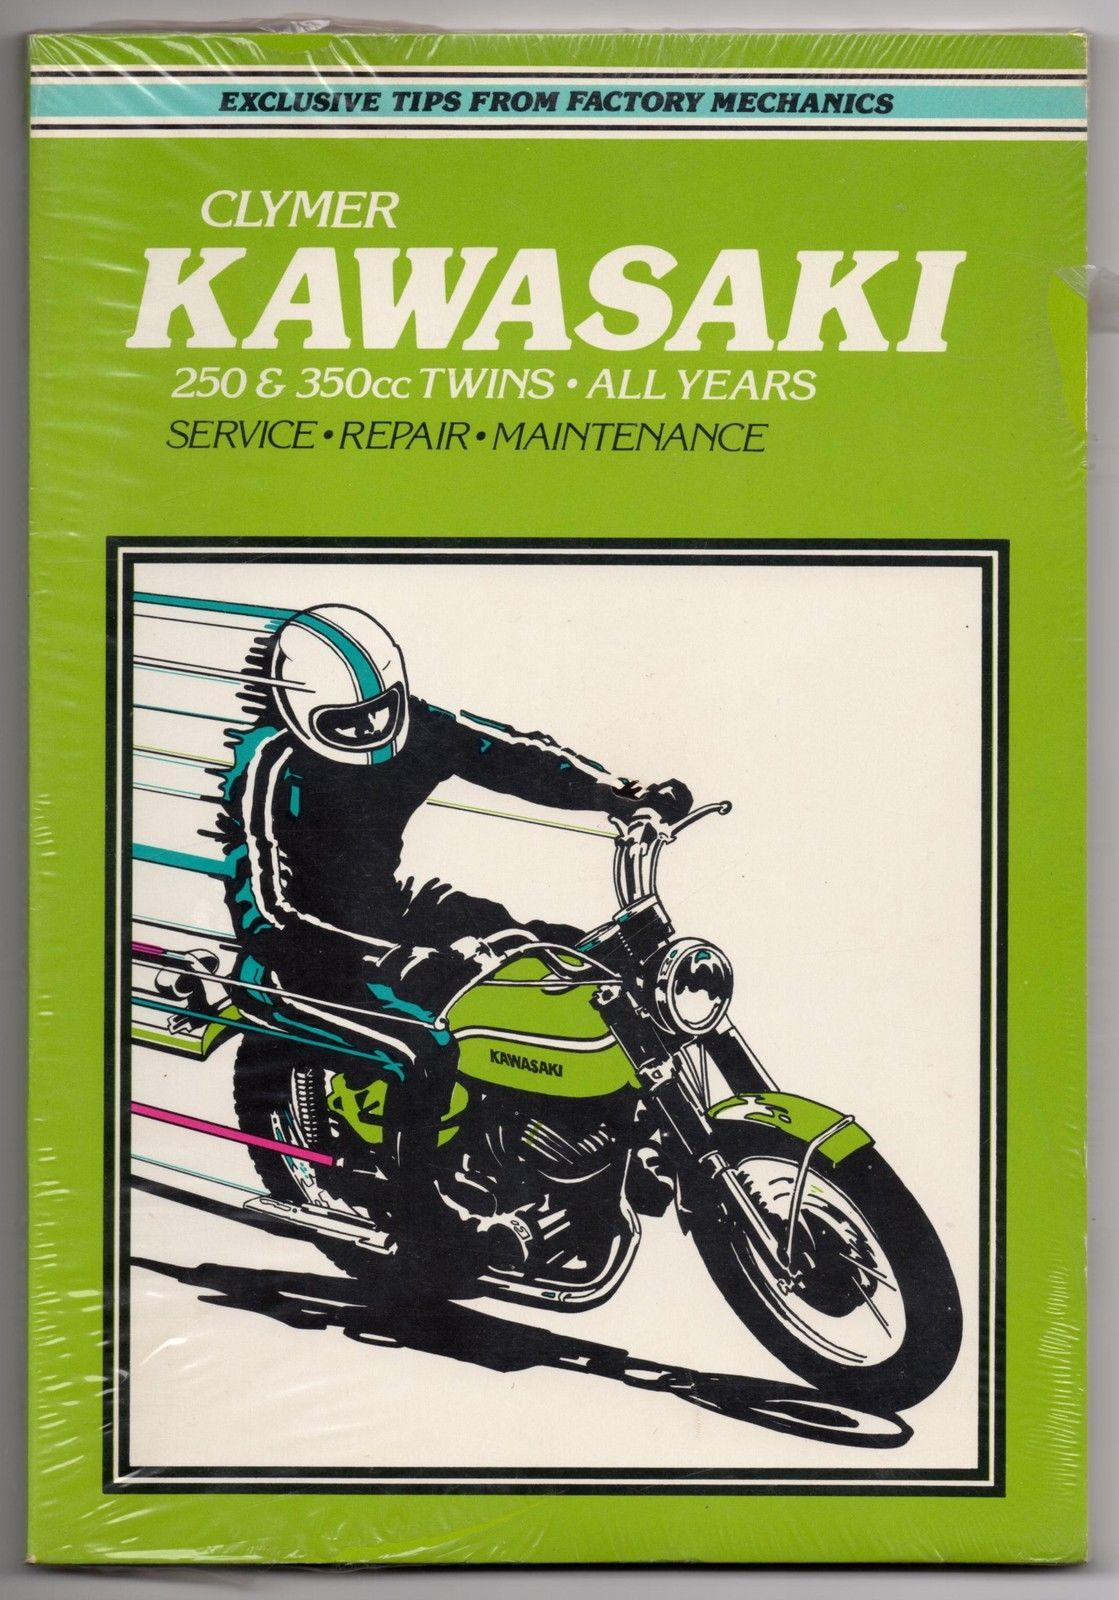 CLYMER KAWASAKI 250 AND 350 TWINS – ALL YEARS SHOP MANUAL-NEW!!!